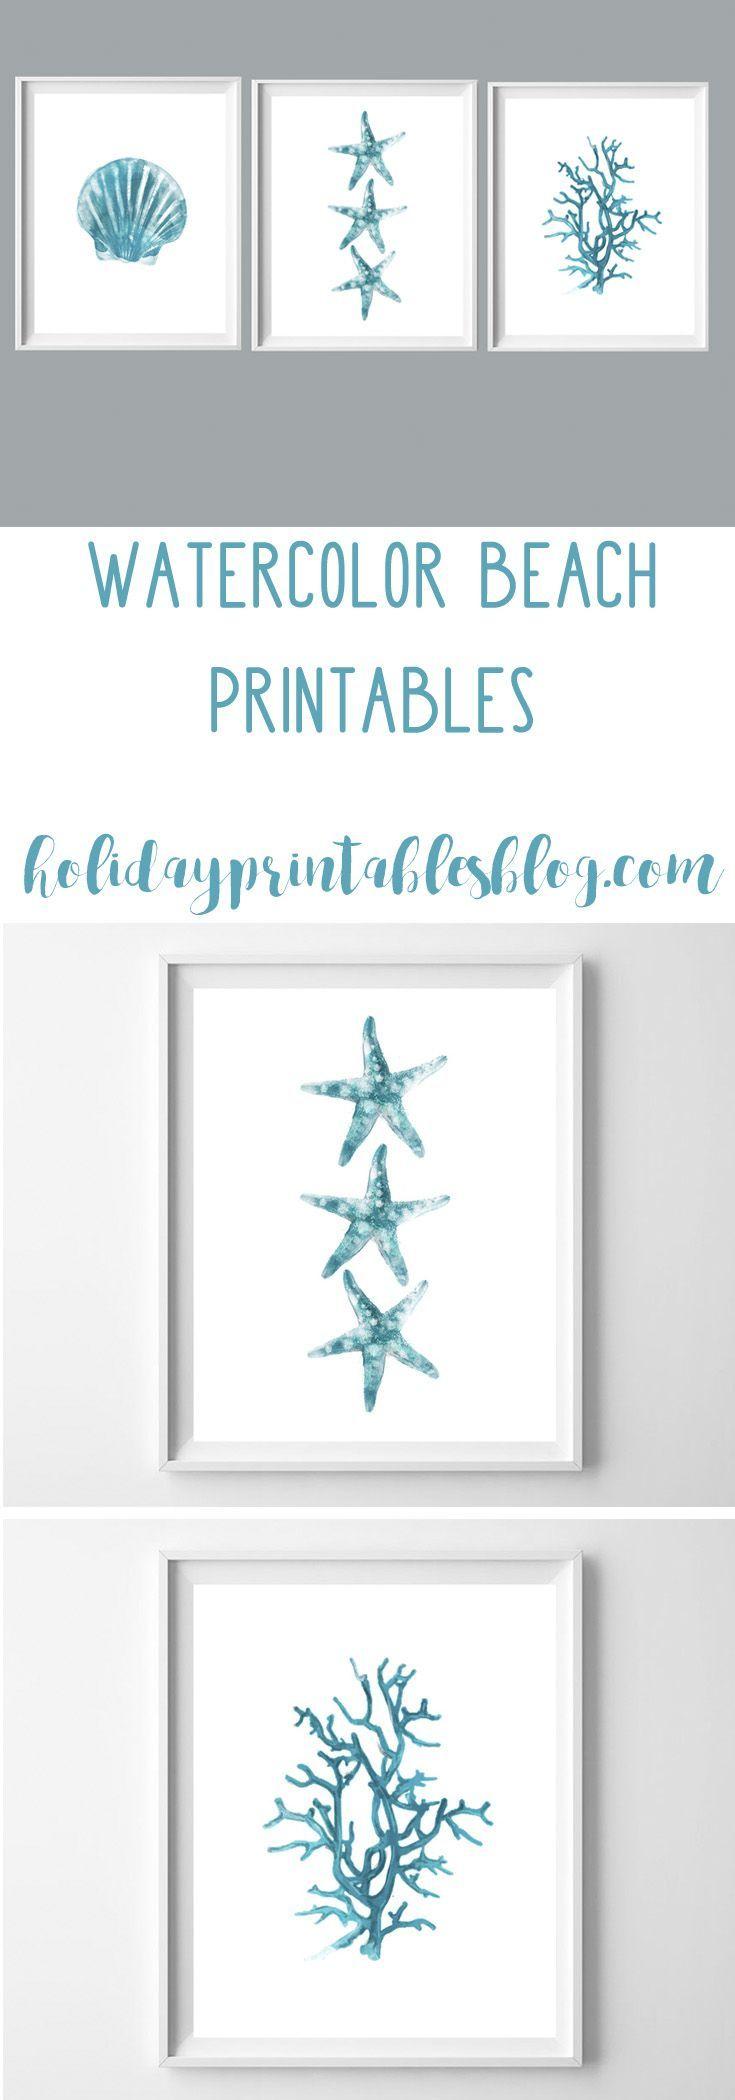 Watercolor Beach Printables | Free Printable Art | Beach House - Free Printable Decor